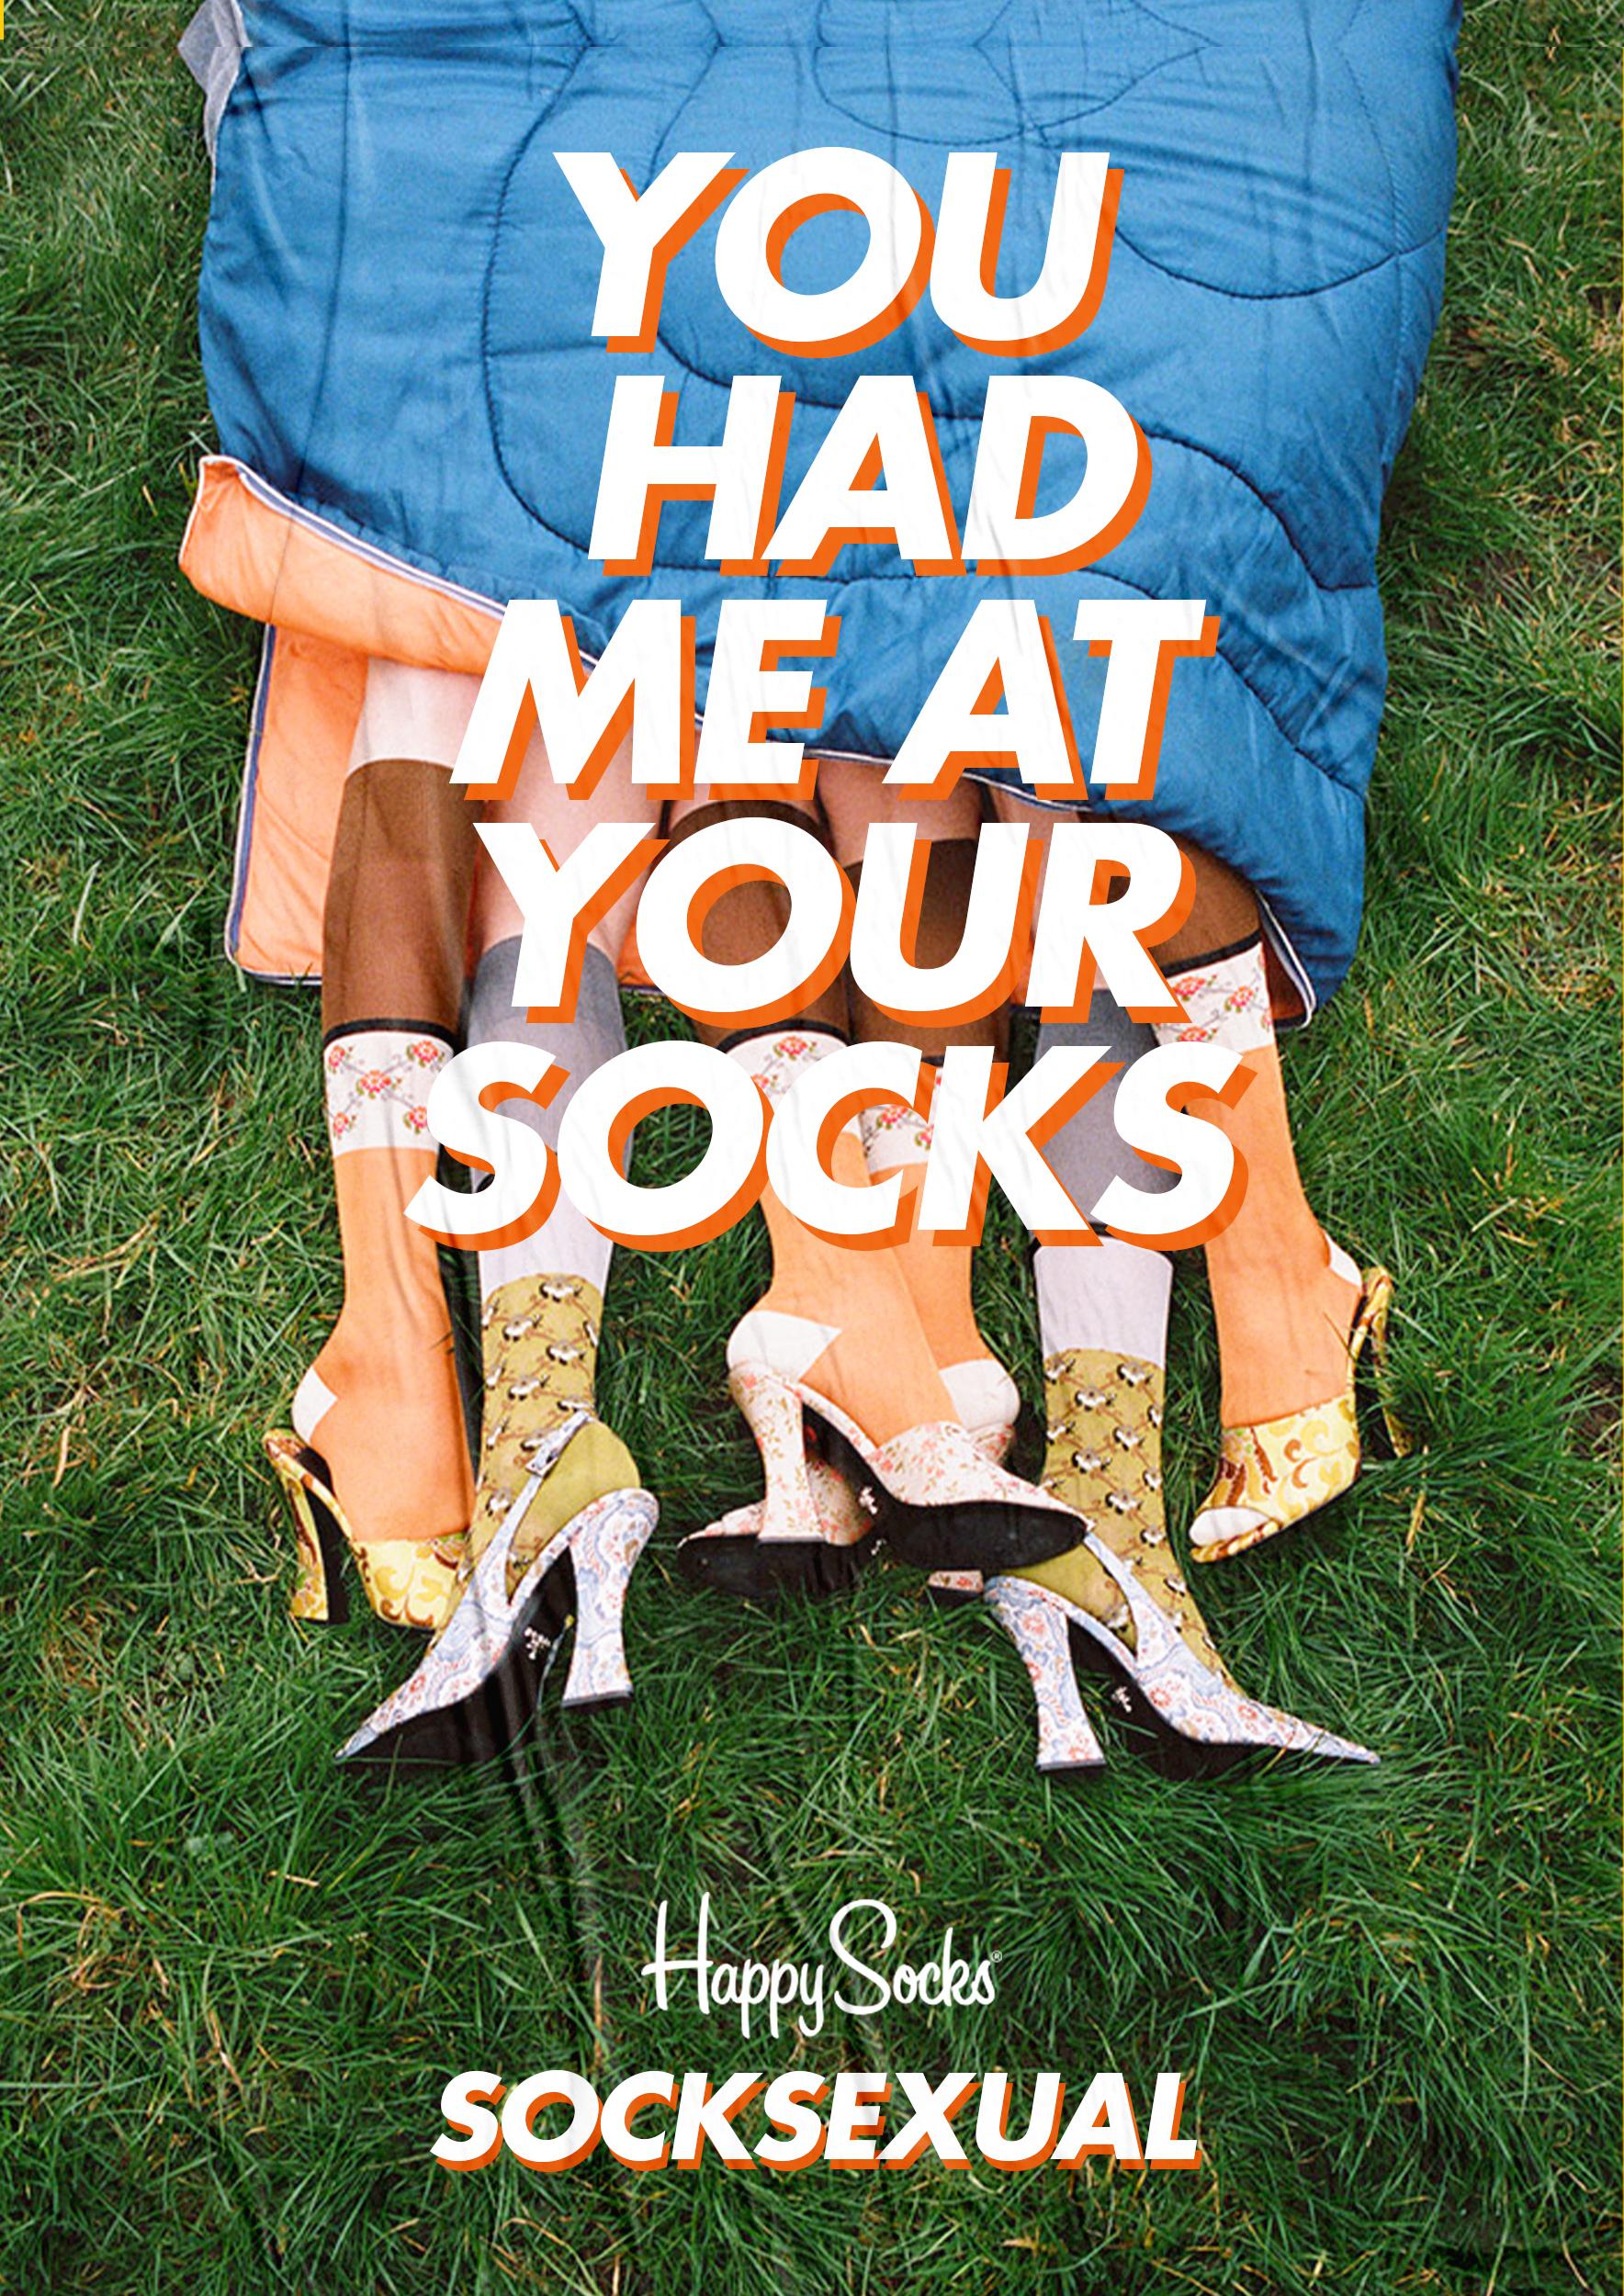 socksexual-poster3.jpg